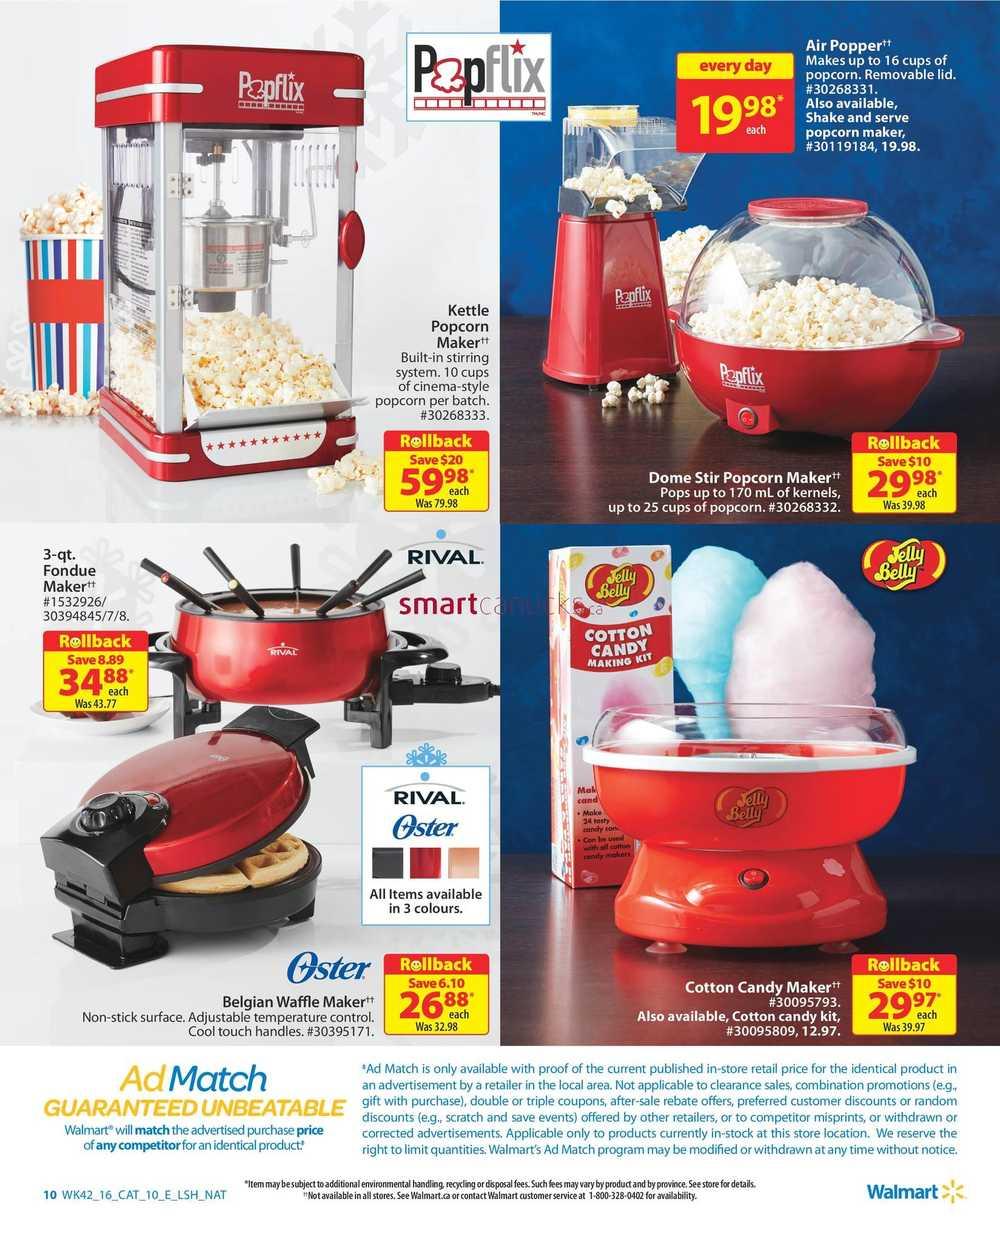 Walmart Holiday Decor Entertaining Catalogue November 10